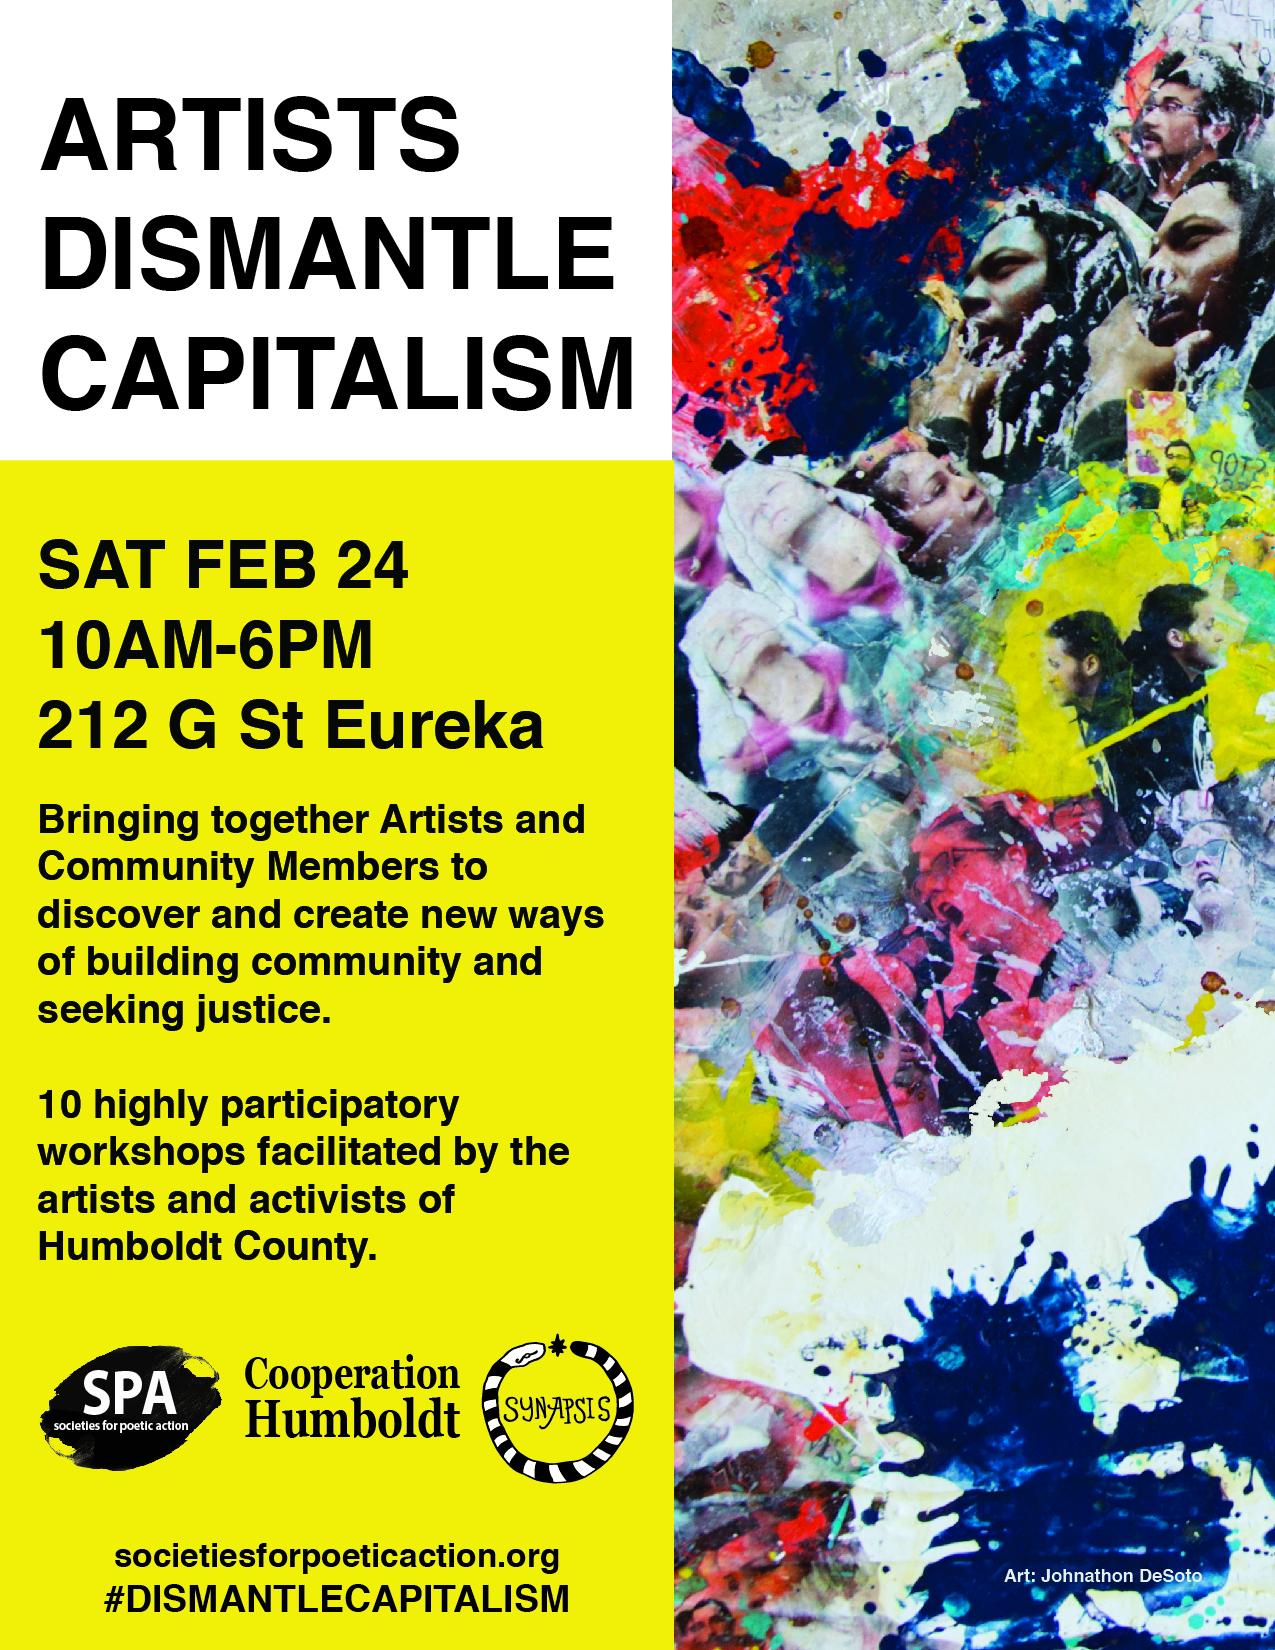 artist dismantle capitalism posters-04.jpg